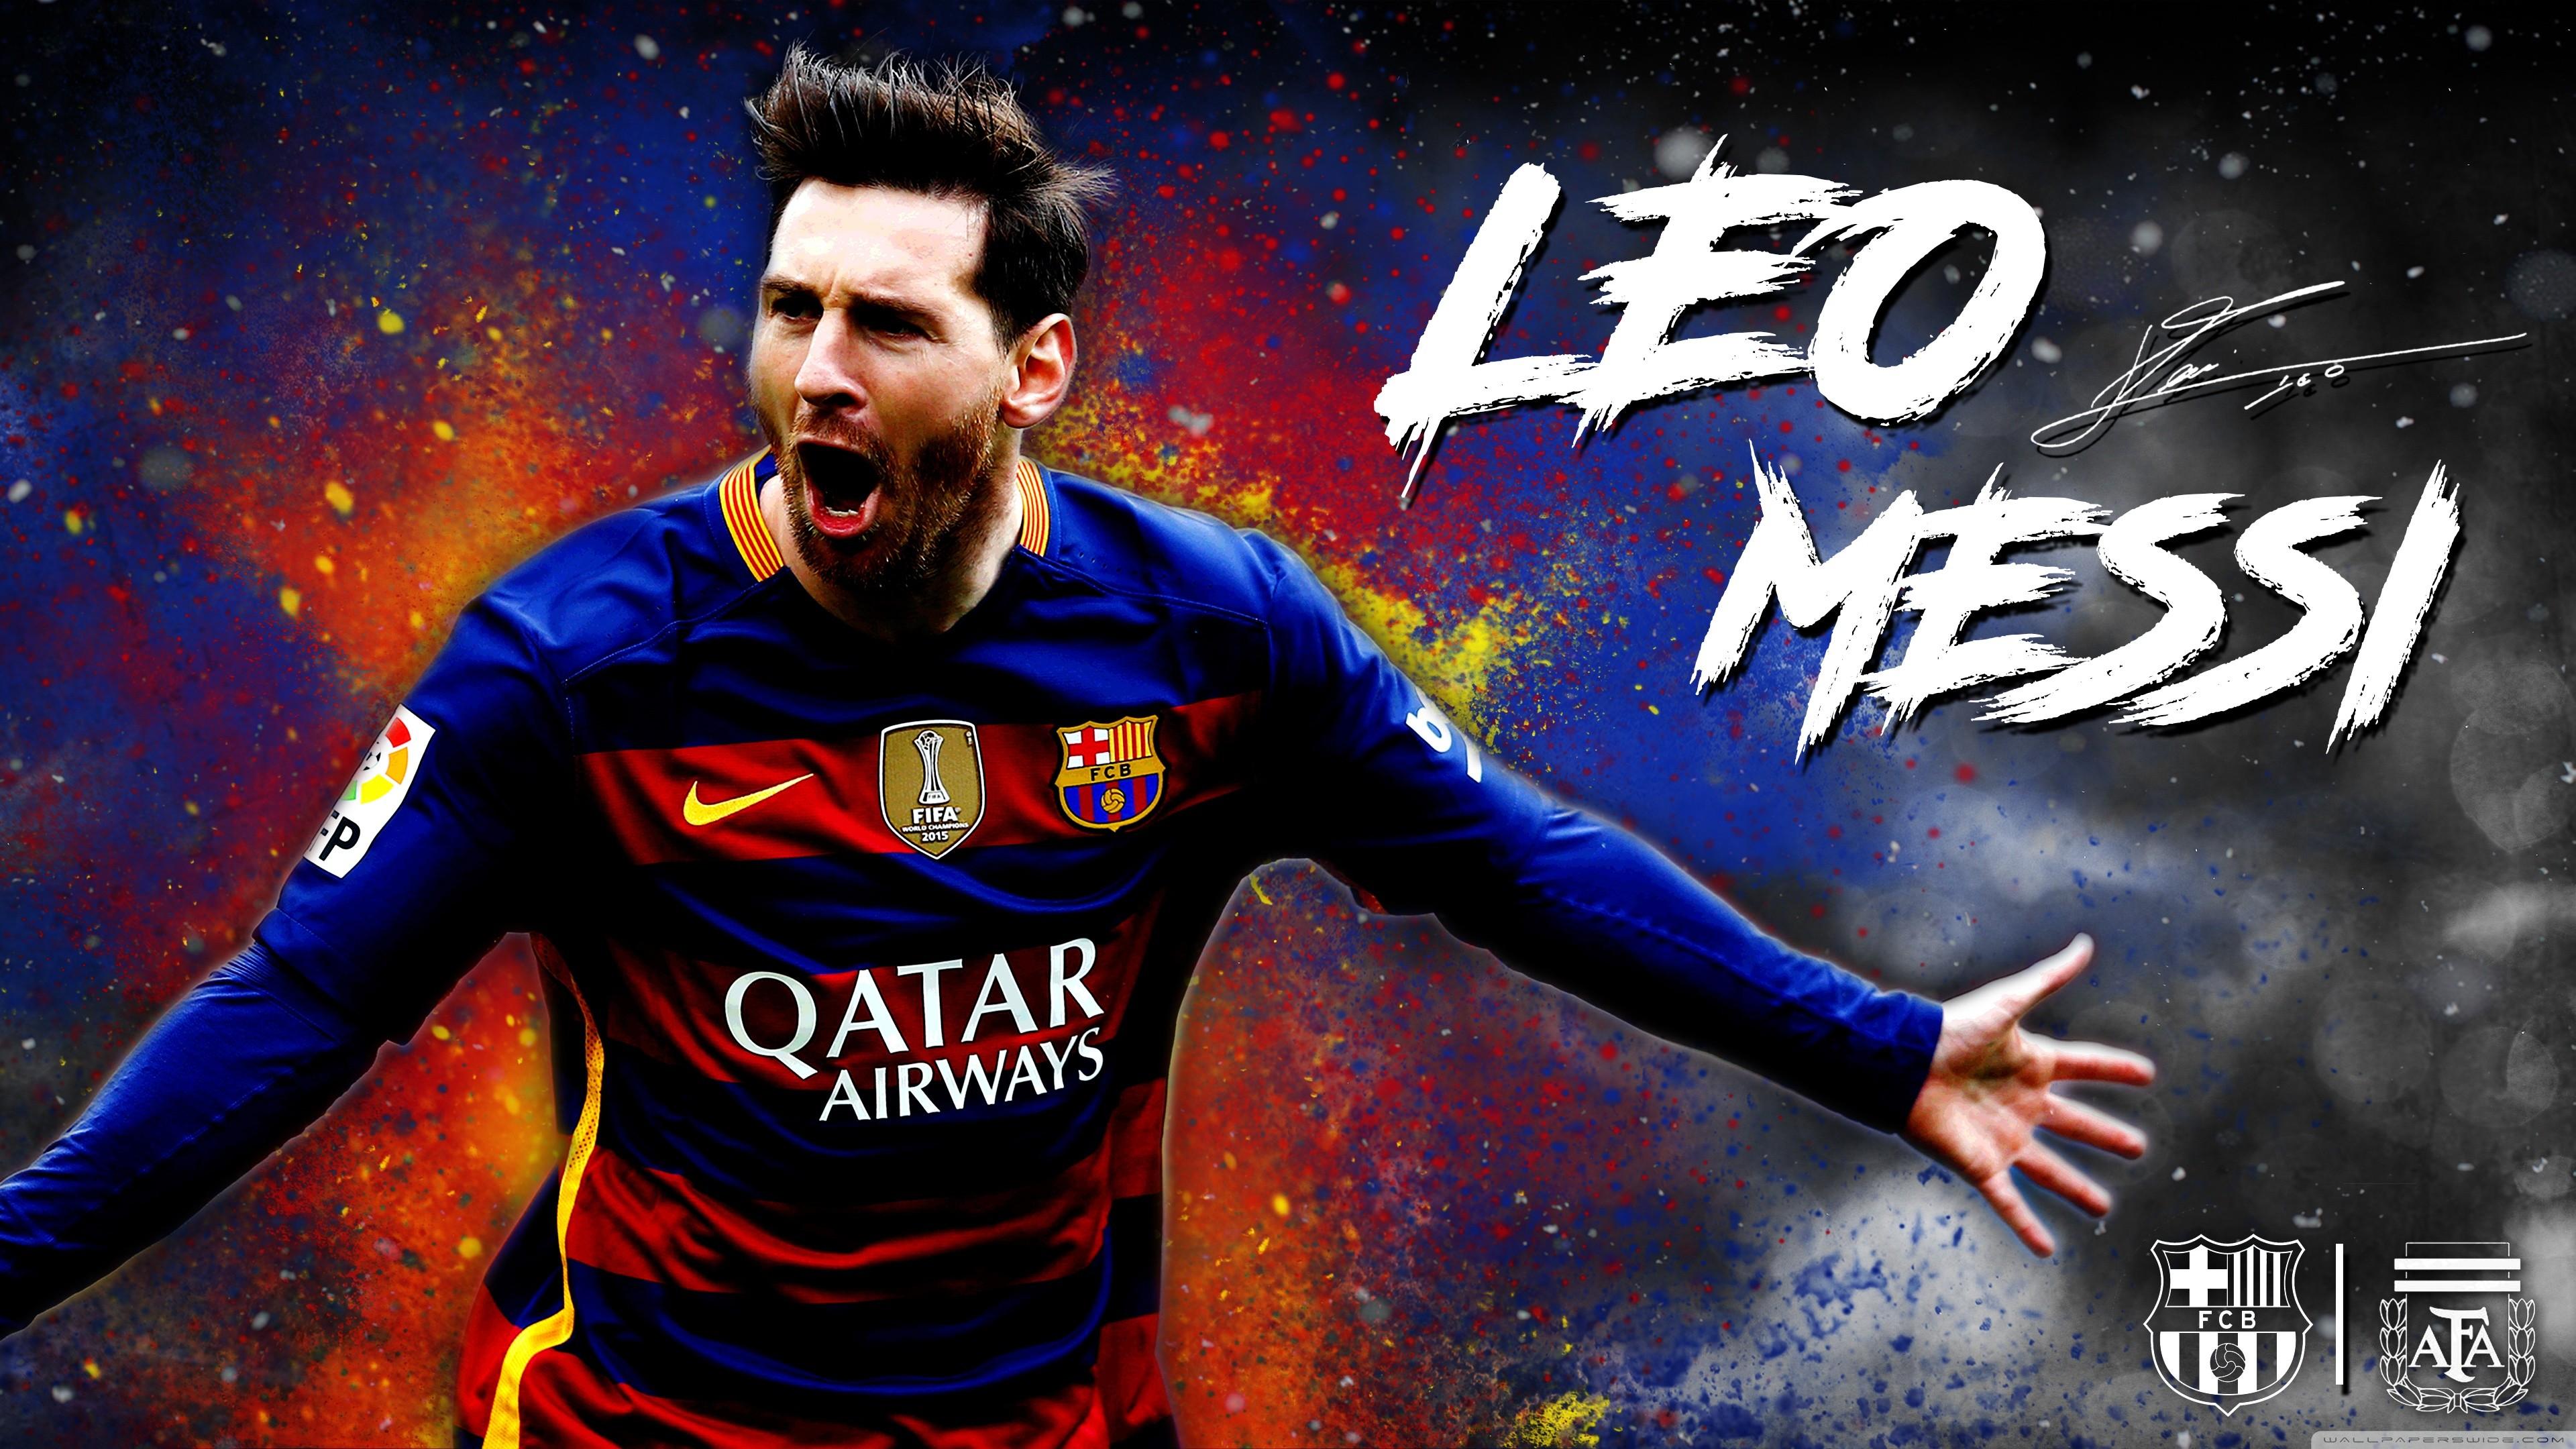 Download hình nền Lionel Messi đẹp nhất cho Desktop